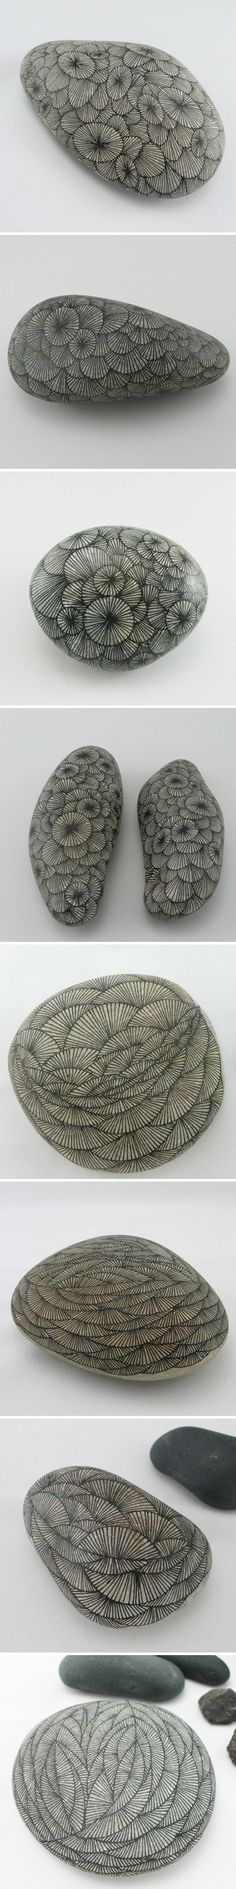 zentangle stones